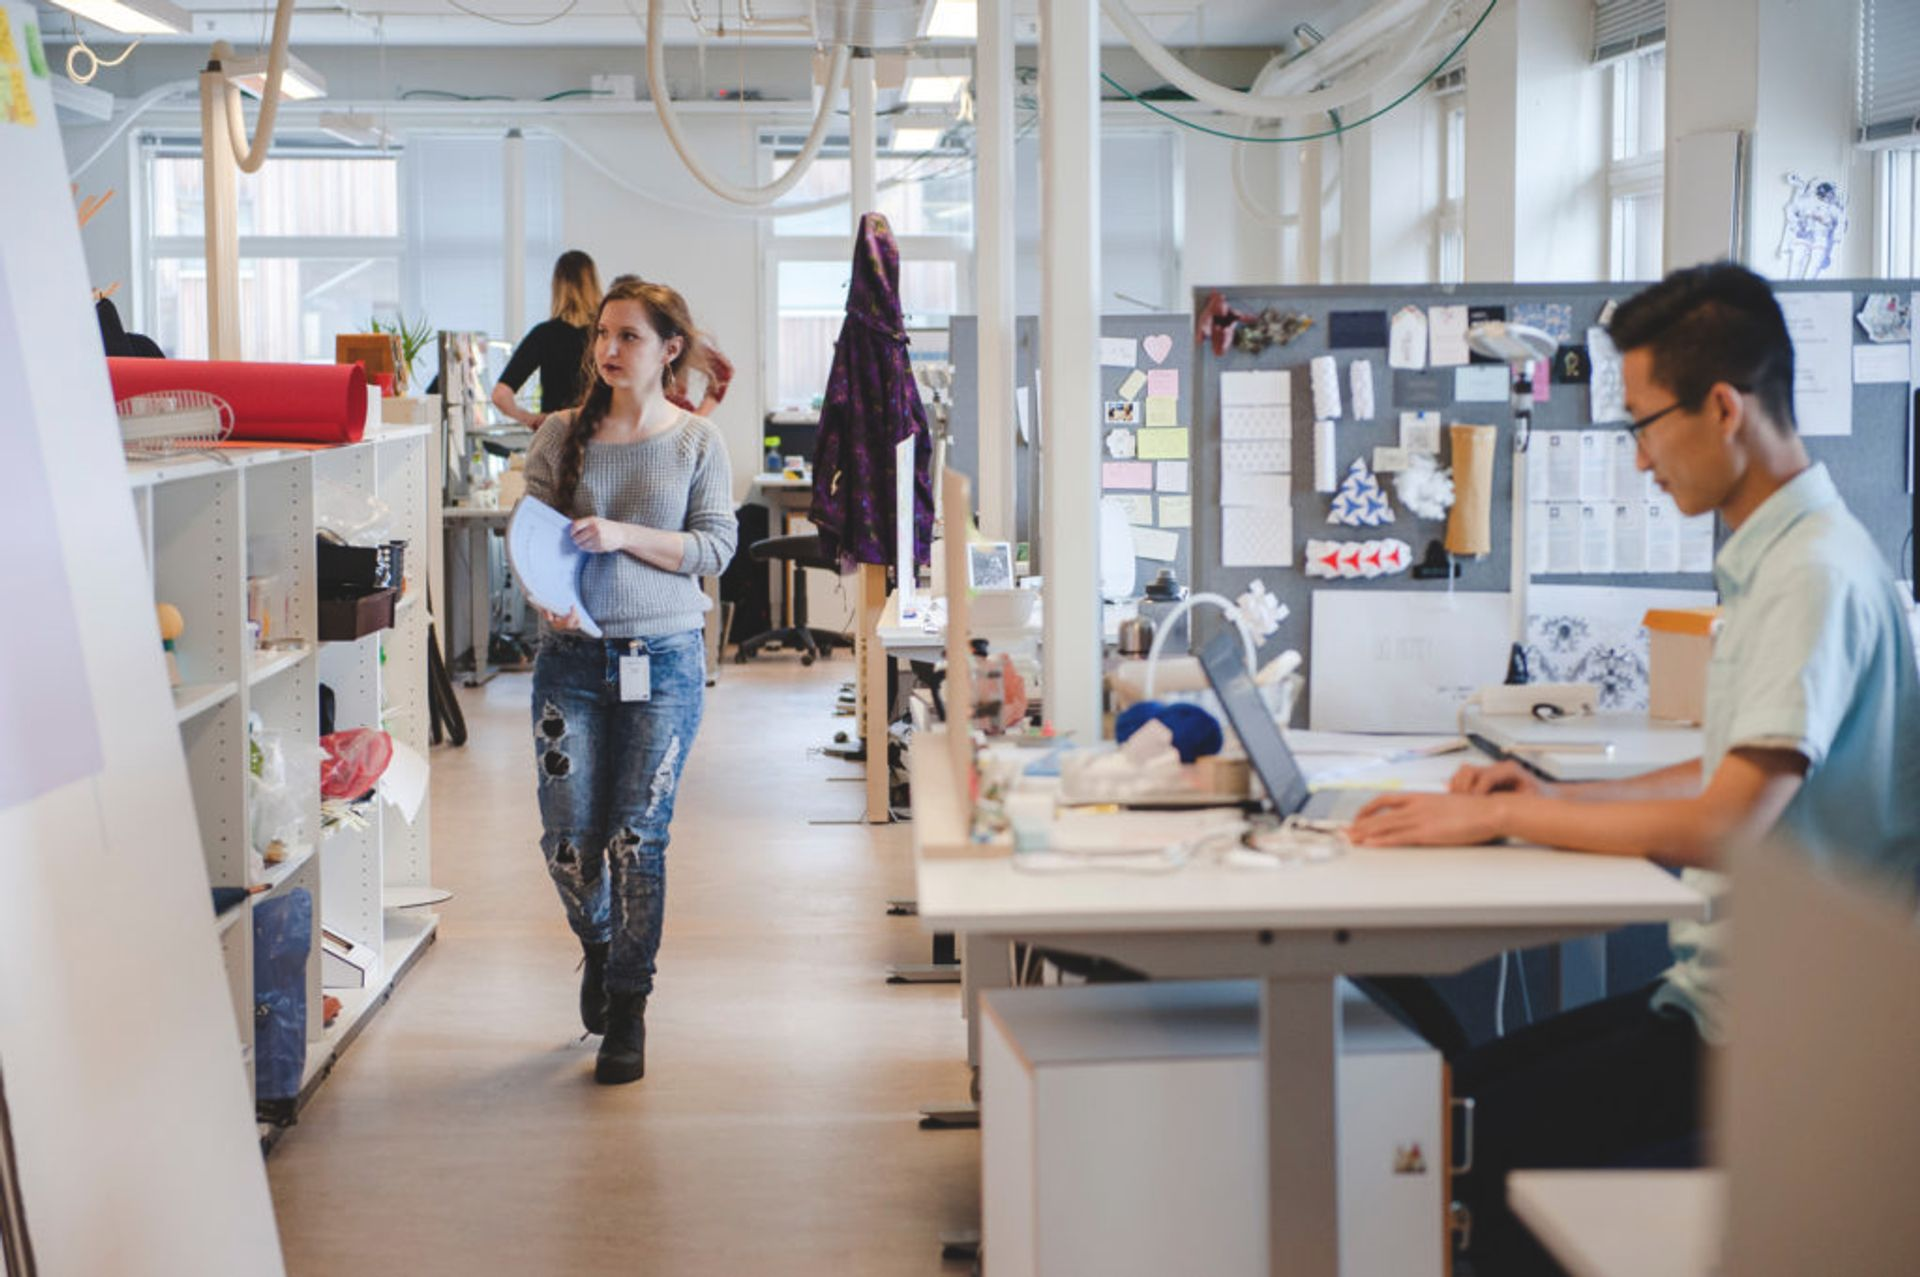 Students walking around a design studio.